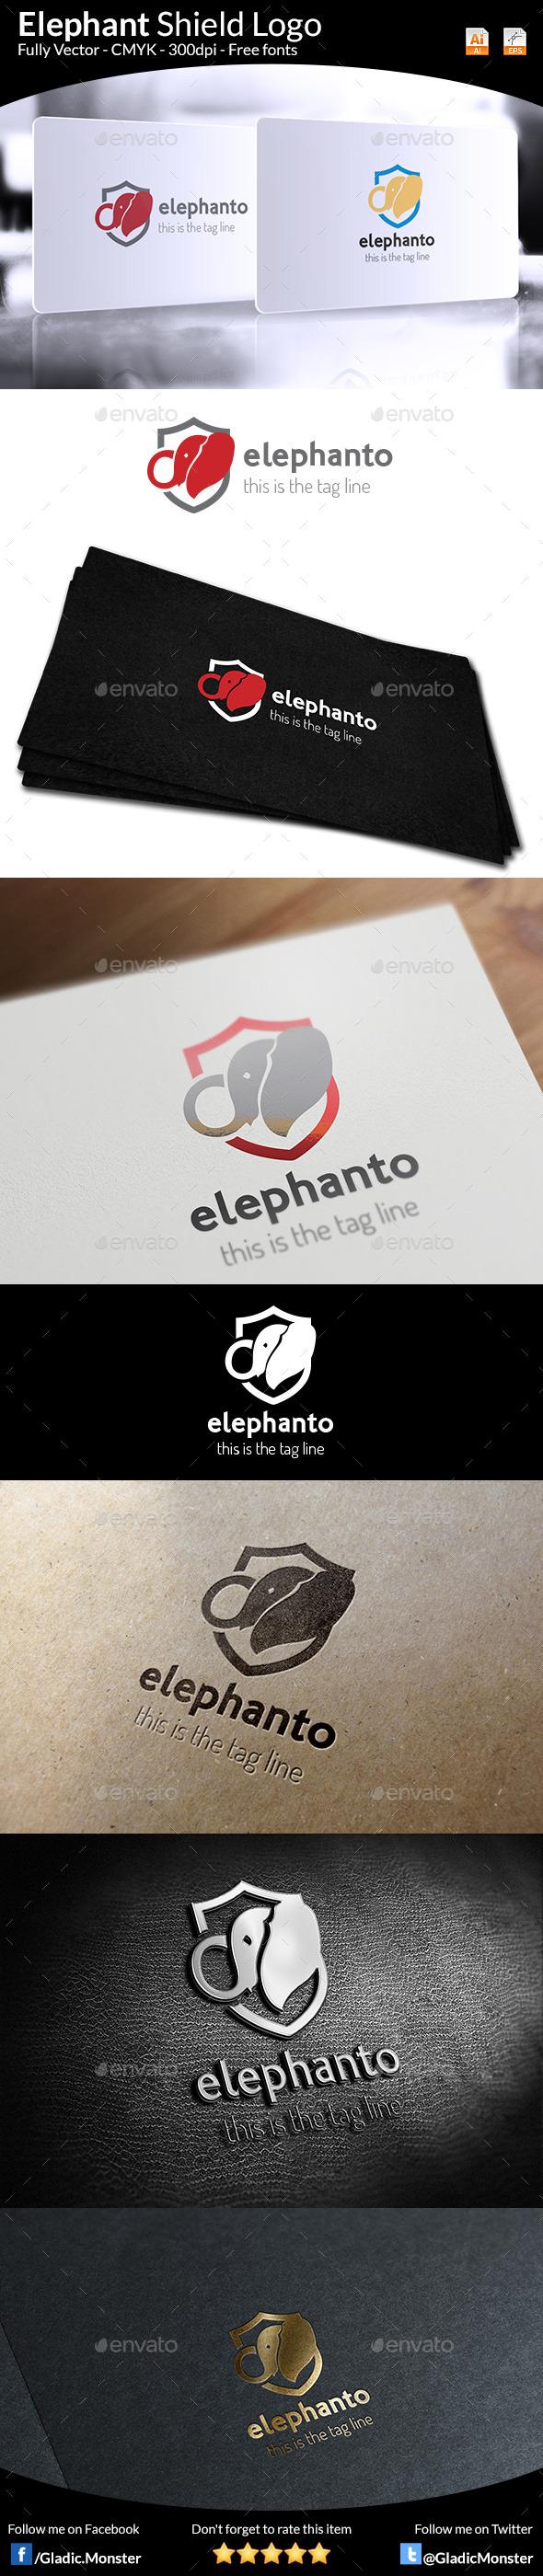 Elephant Shield Logo